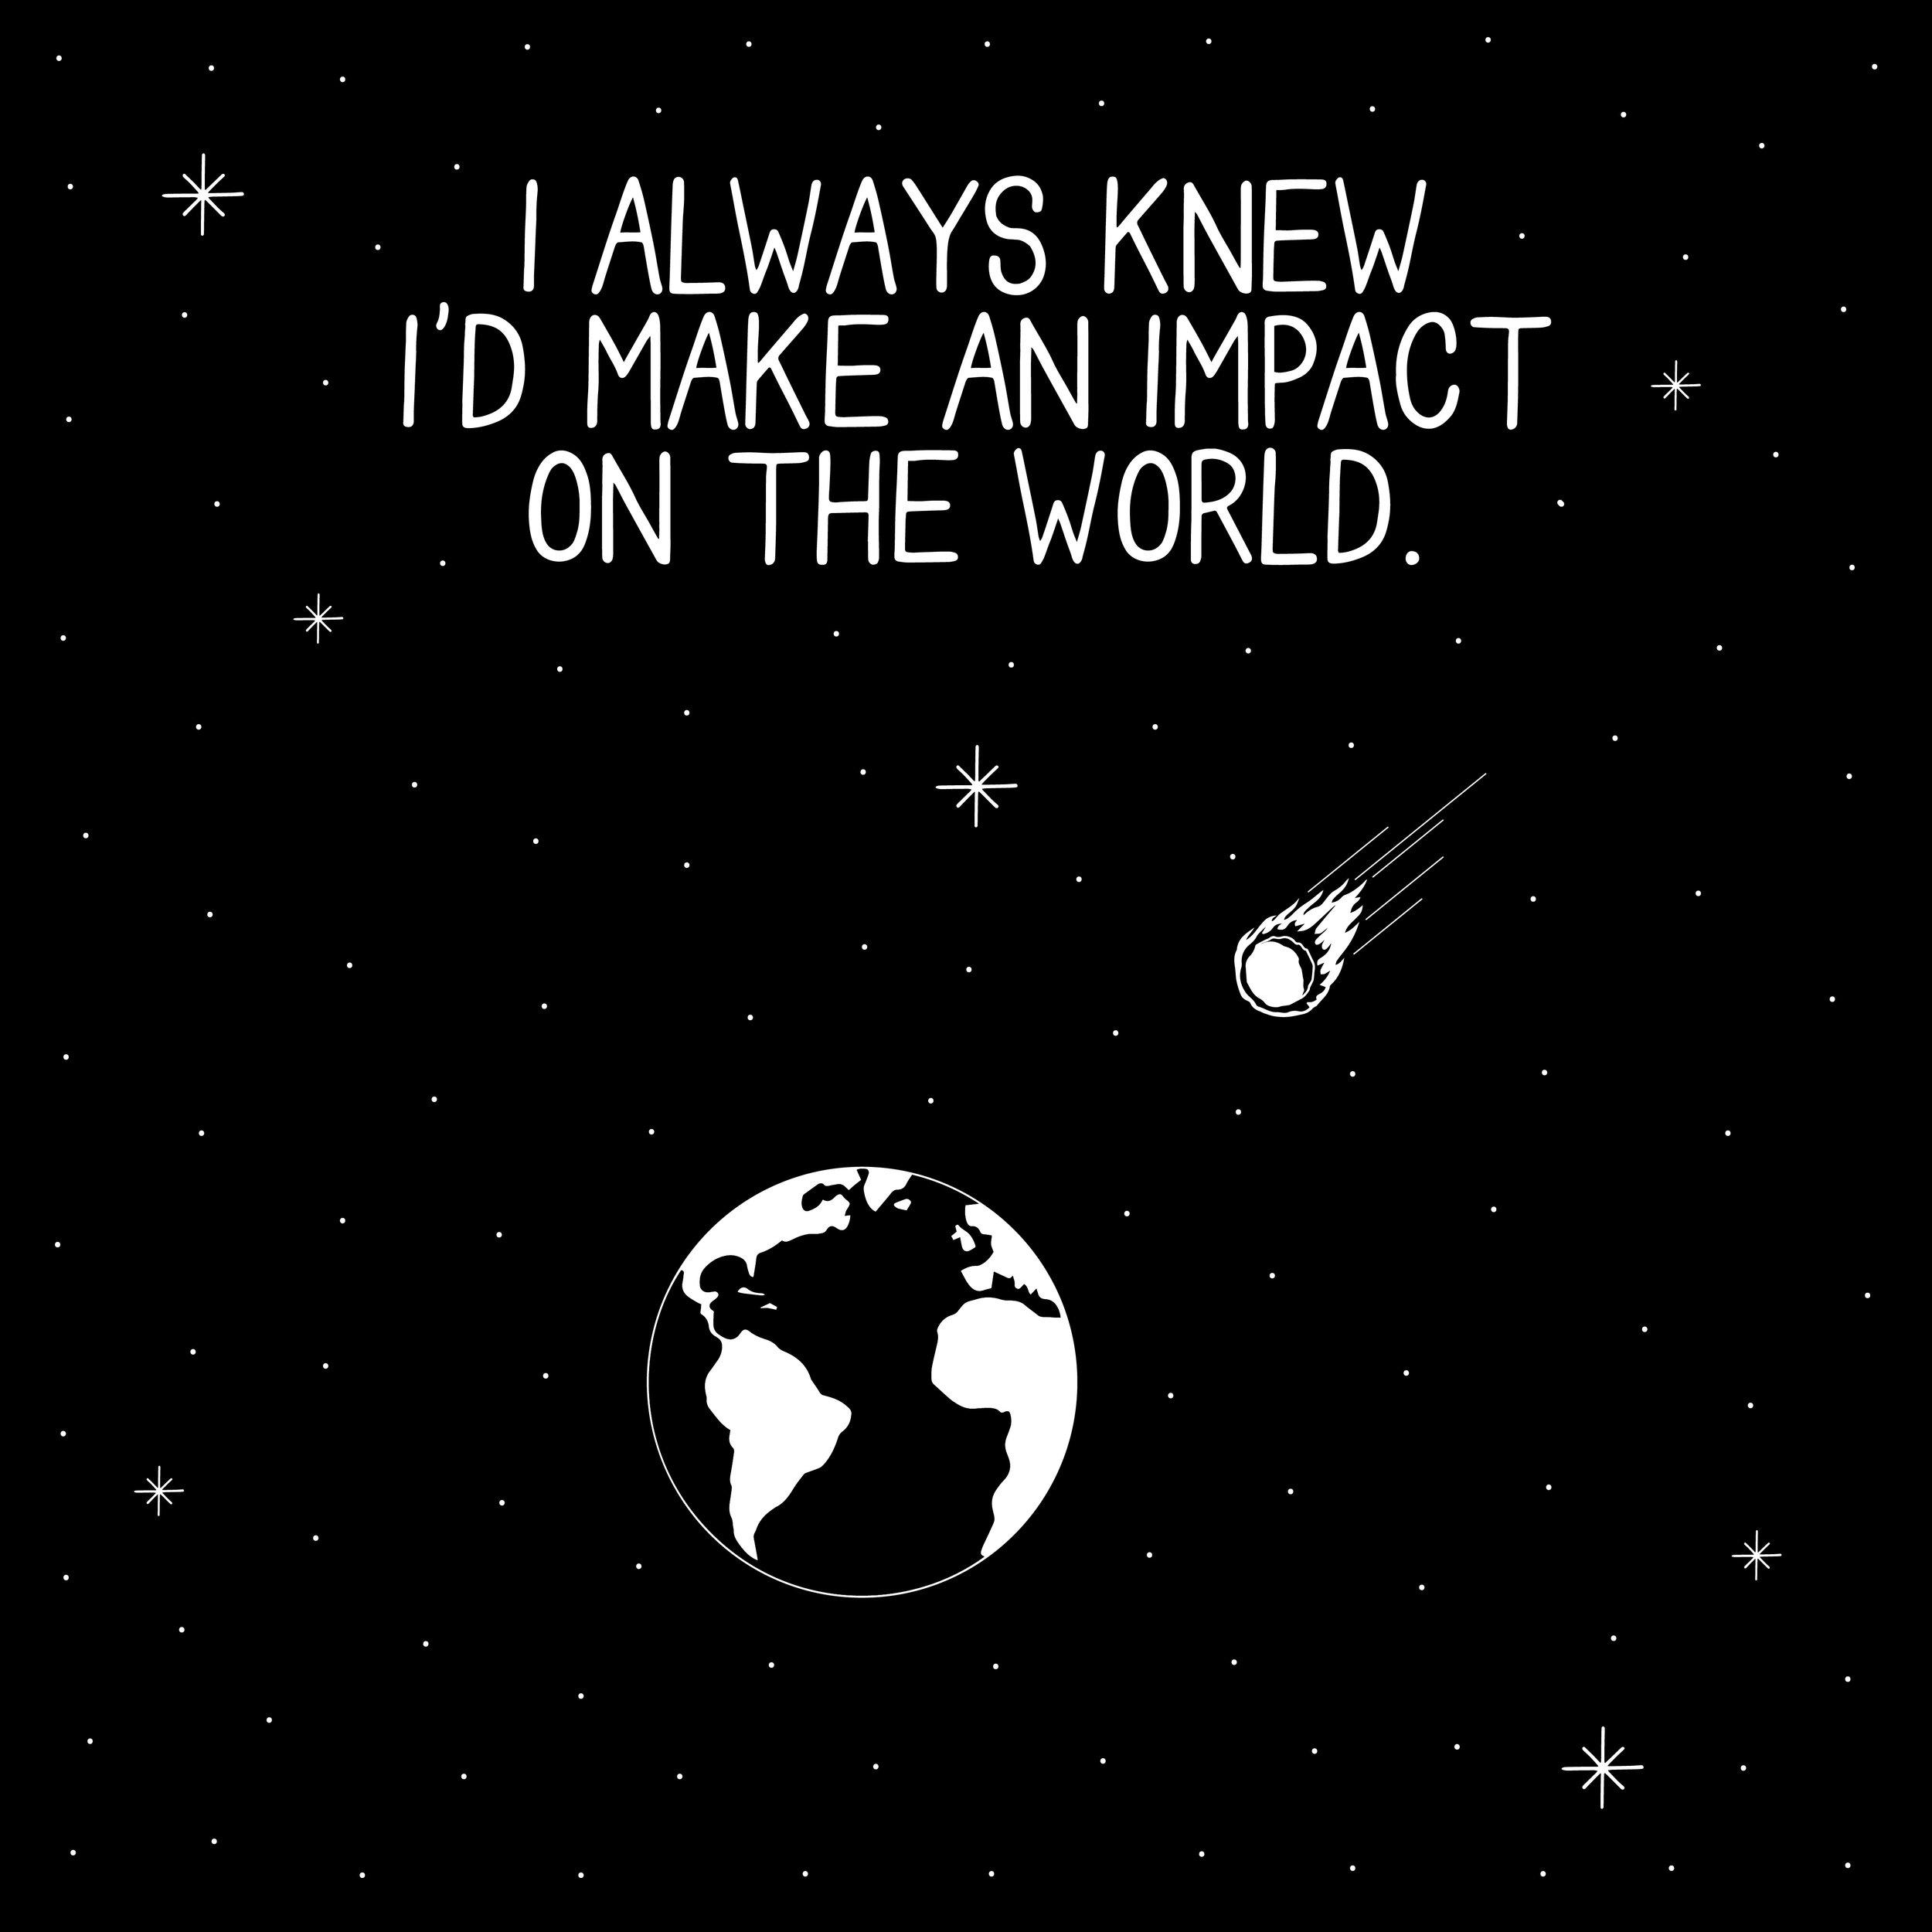 impact-01.jpg